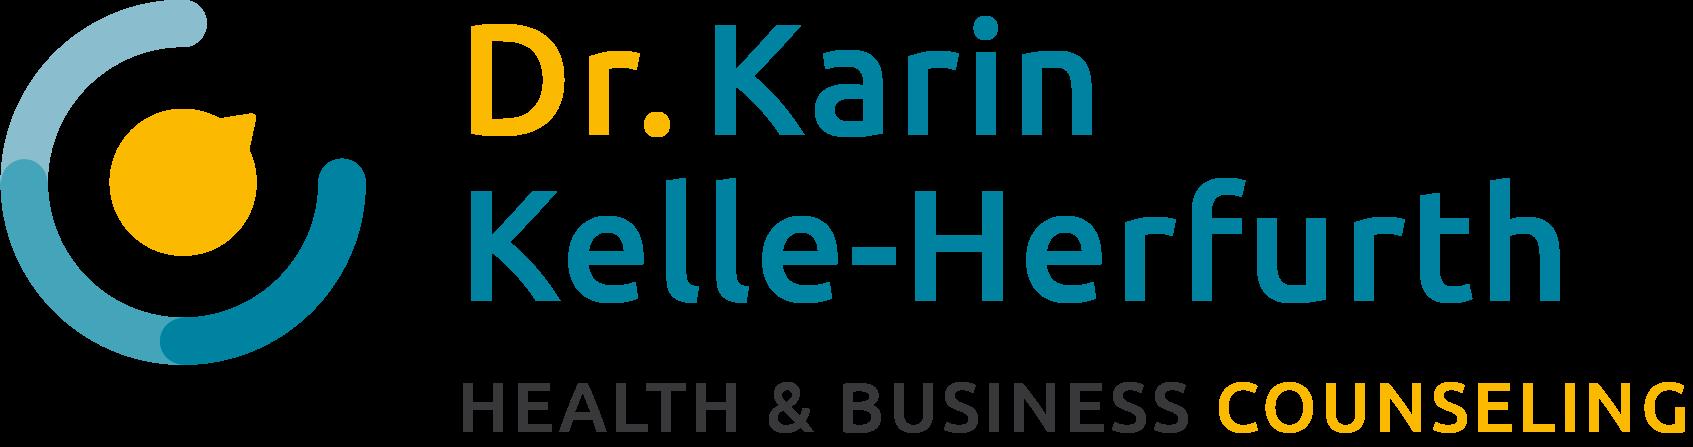 Dr. med. Karin Kelle-Herfurth